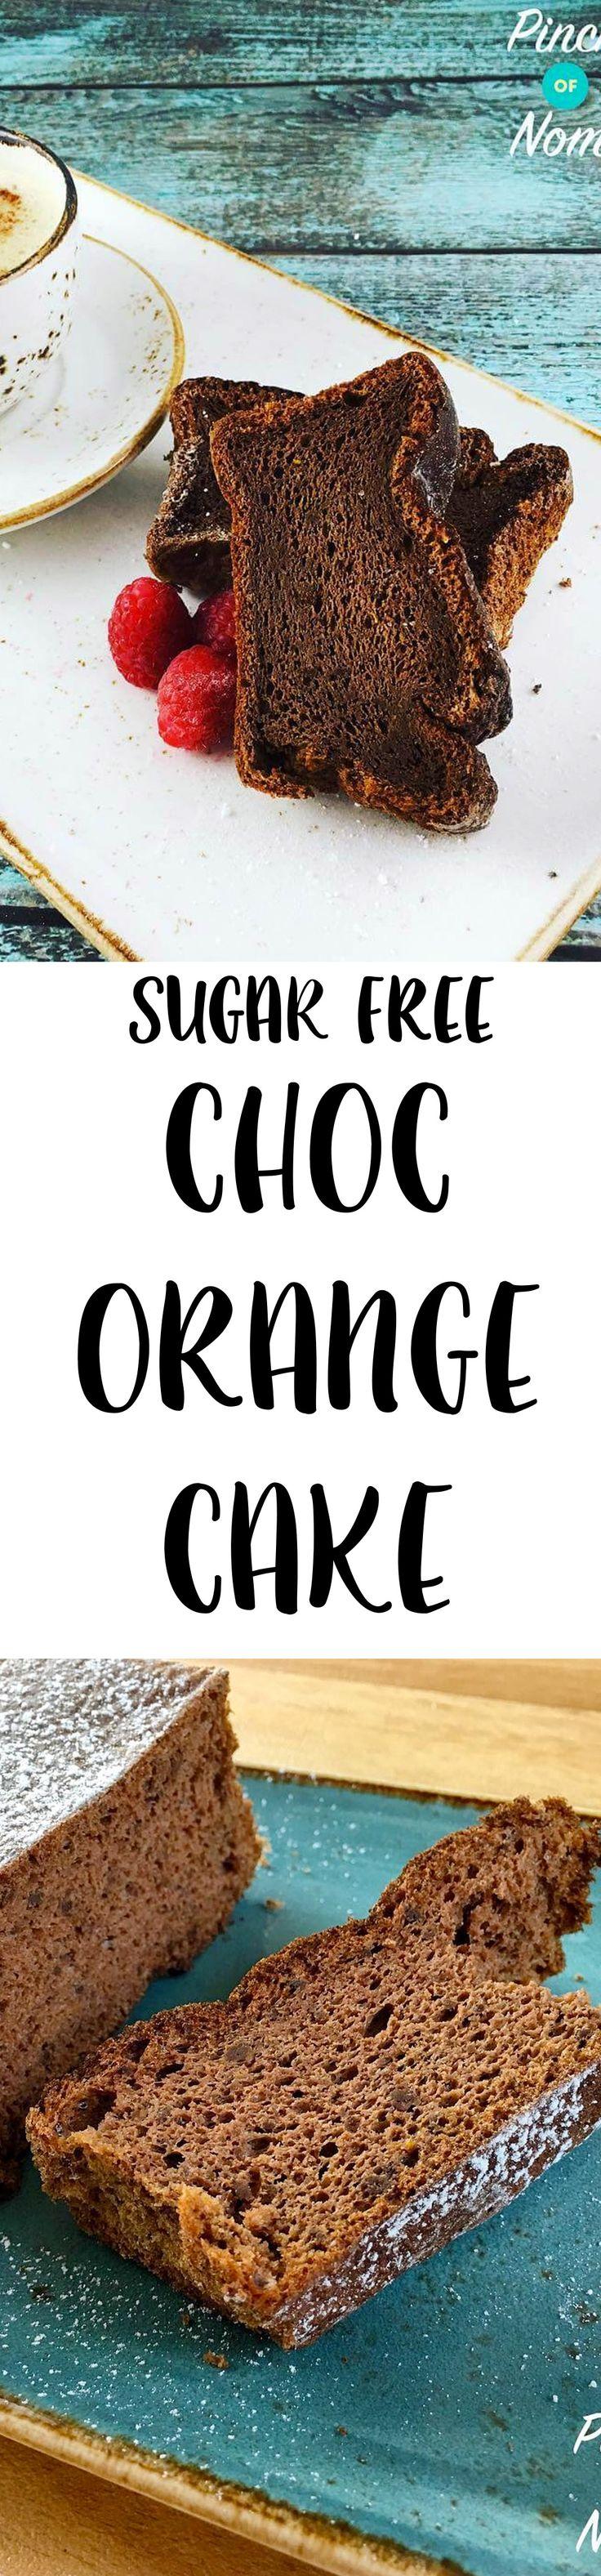 Sugar Free Chocolate & Orange Cake | Slimming World